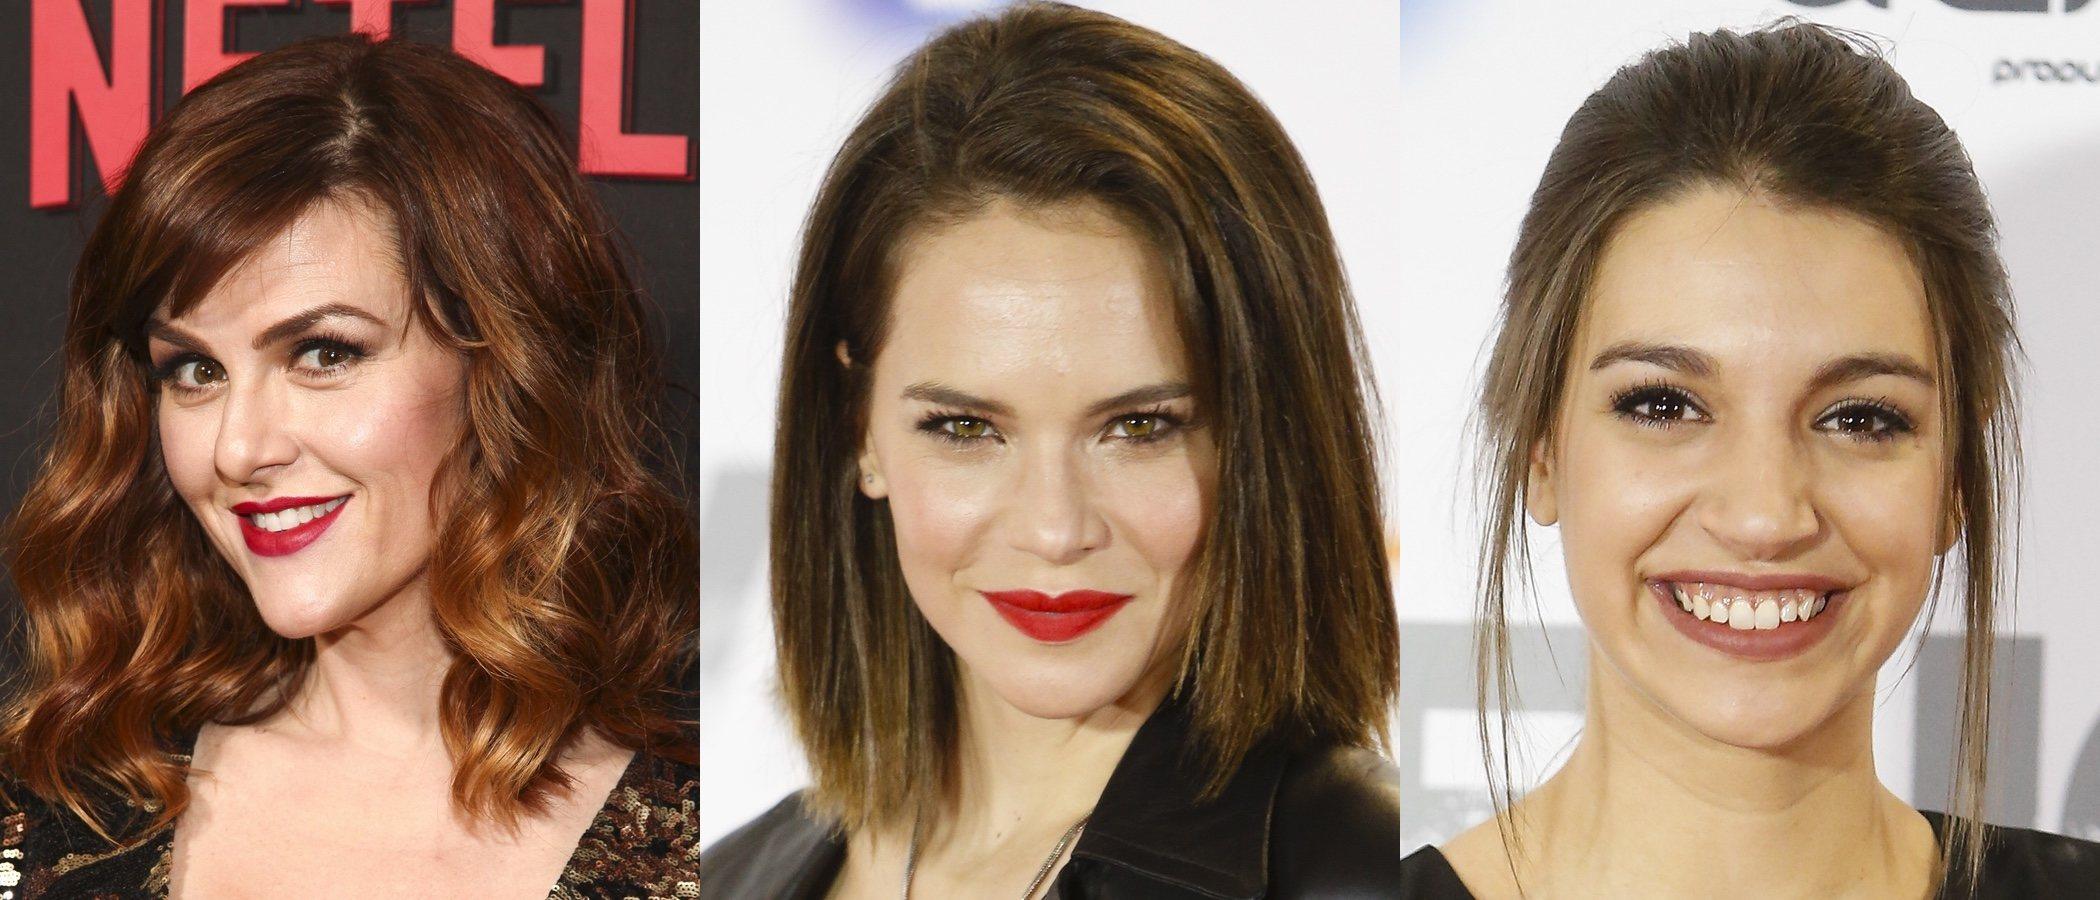 Ana Guerra, Sara Rue y Amber Midthunder, entre los mejores beauty looks de la semana